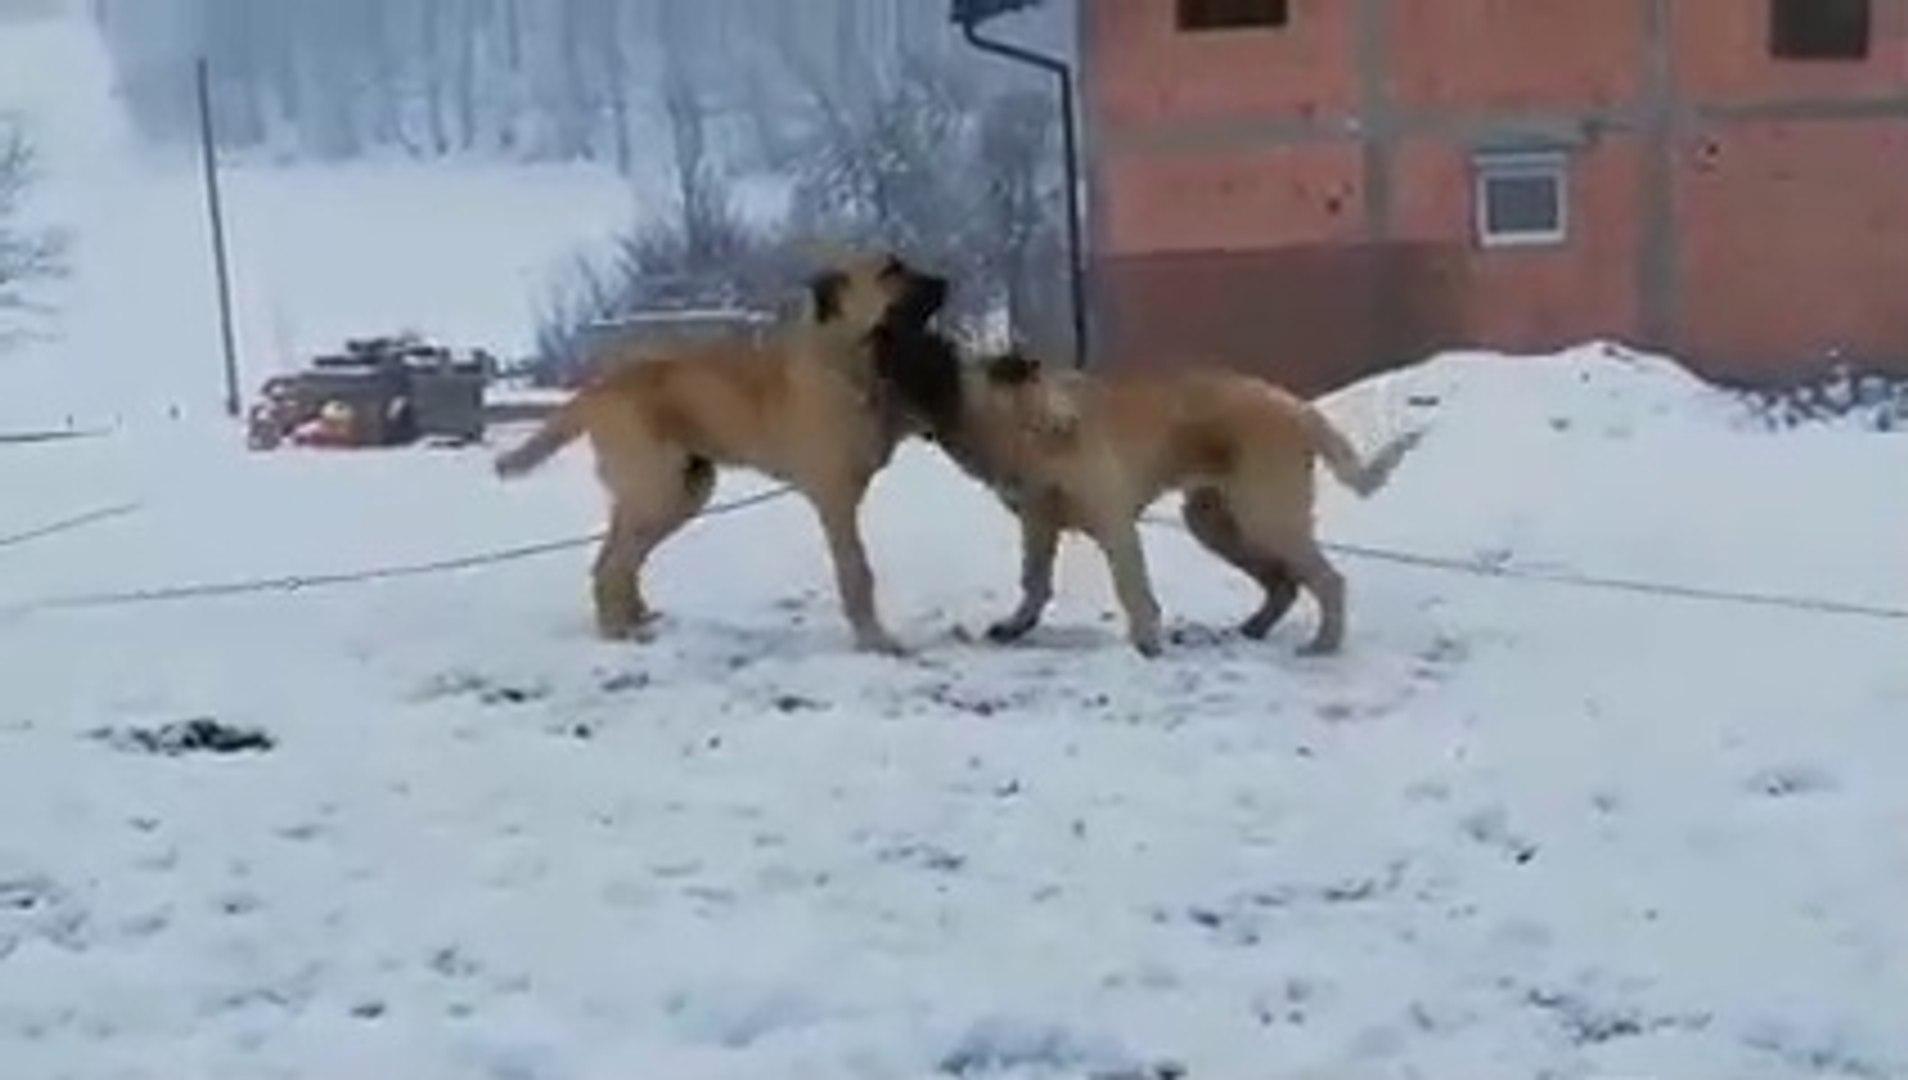 COBAN KOPEGi KARDESLERiN SEViMLi KARSILASMASI - SHEPHERD DOG BROTHERS VS